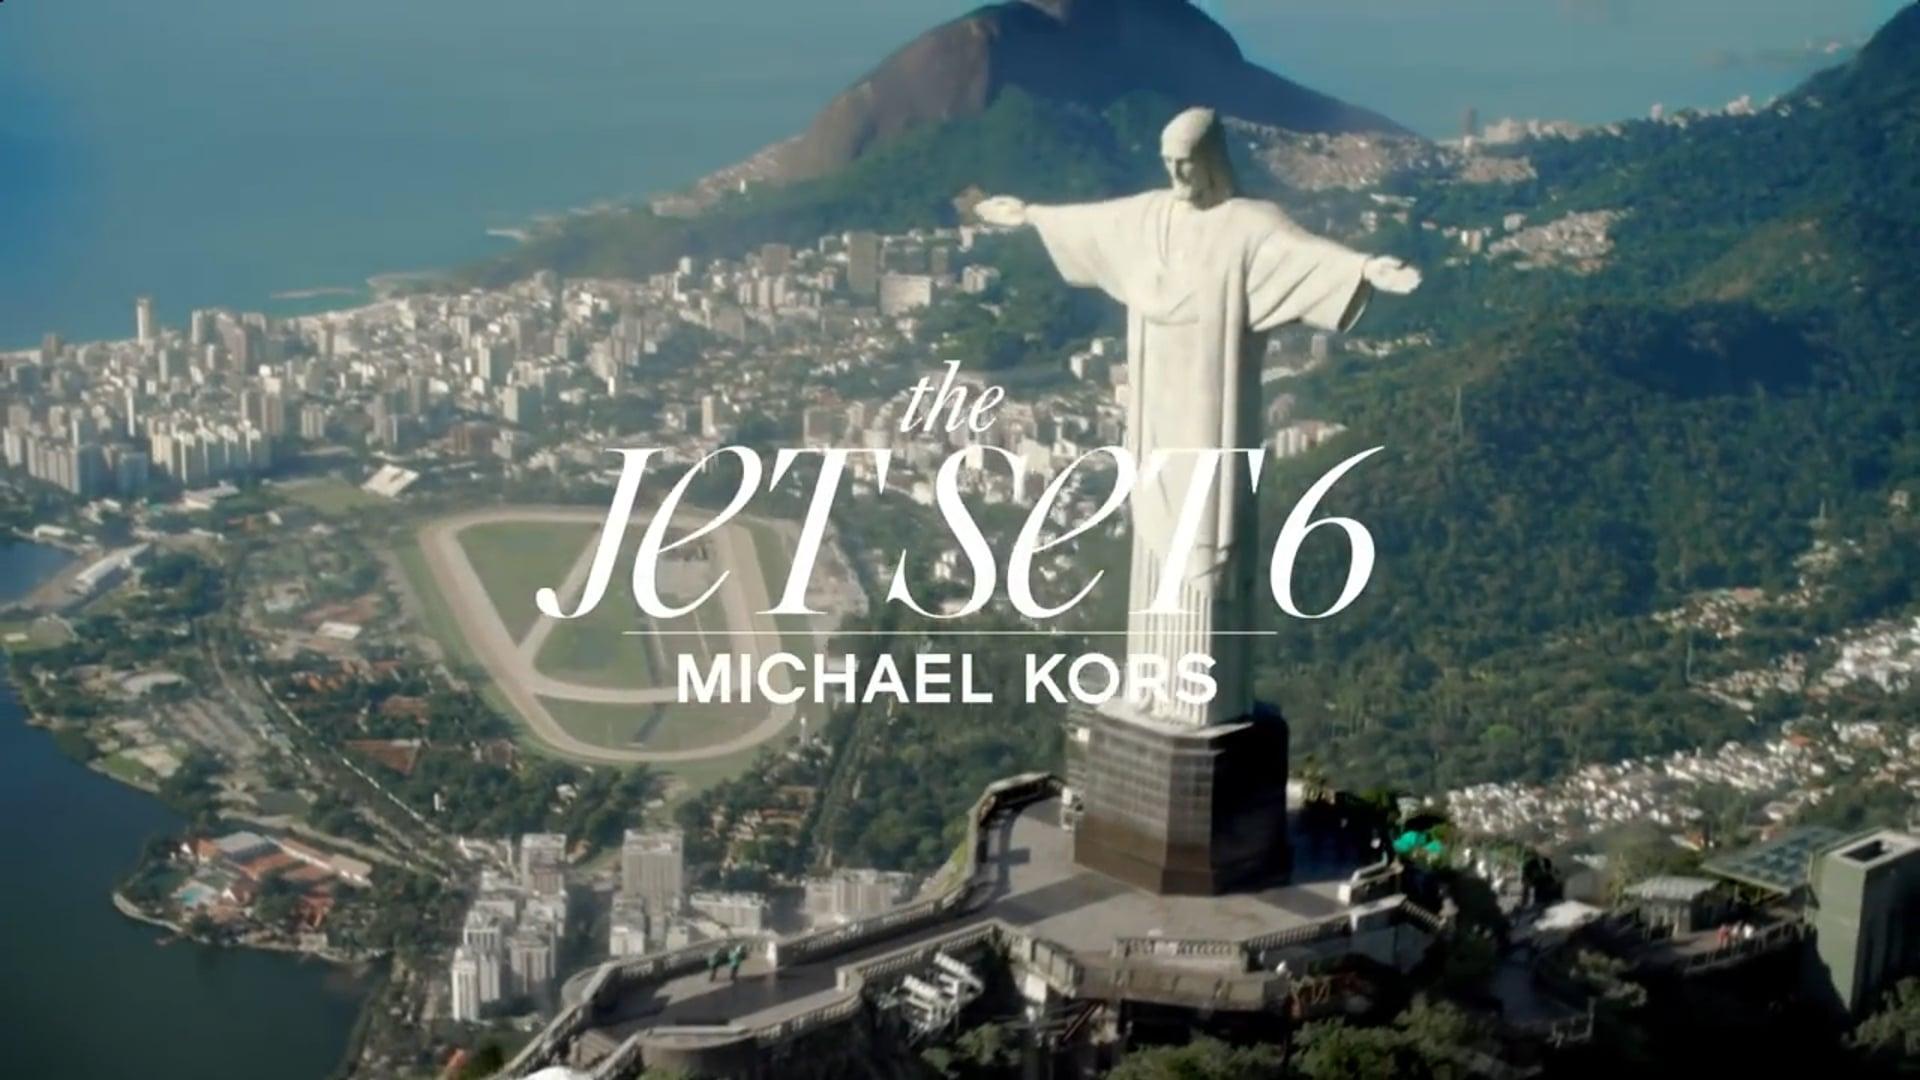 Introducing the Michael Kors Jet Set 6 Collection